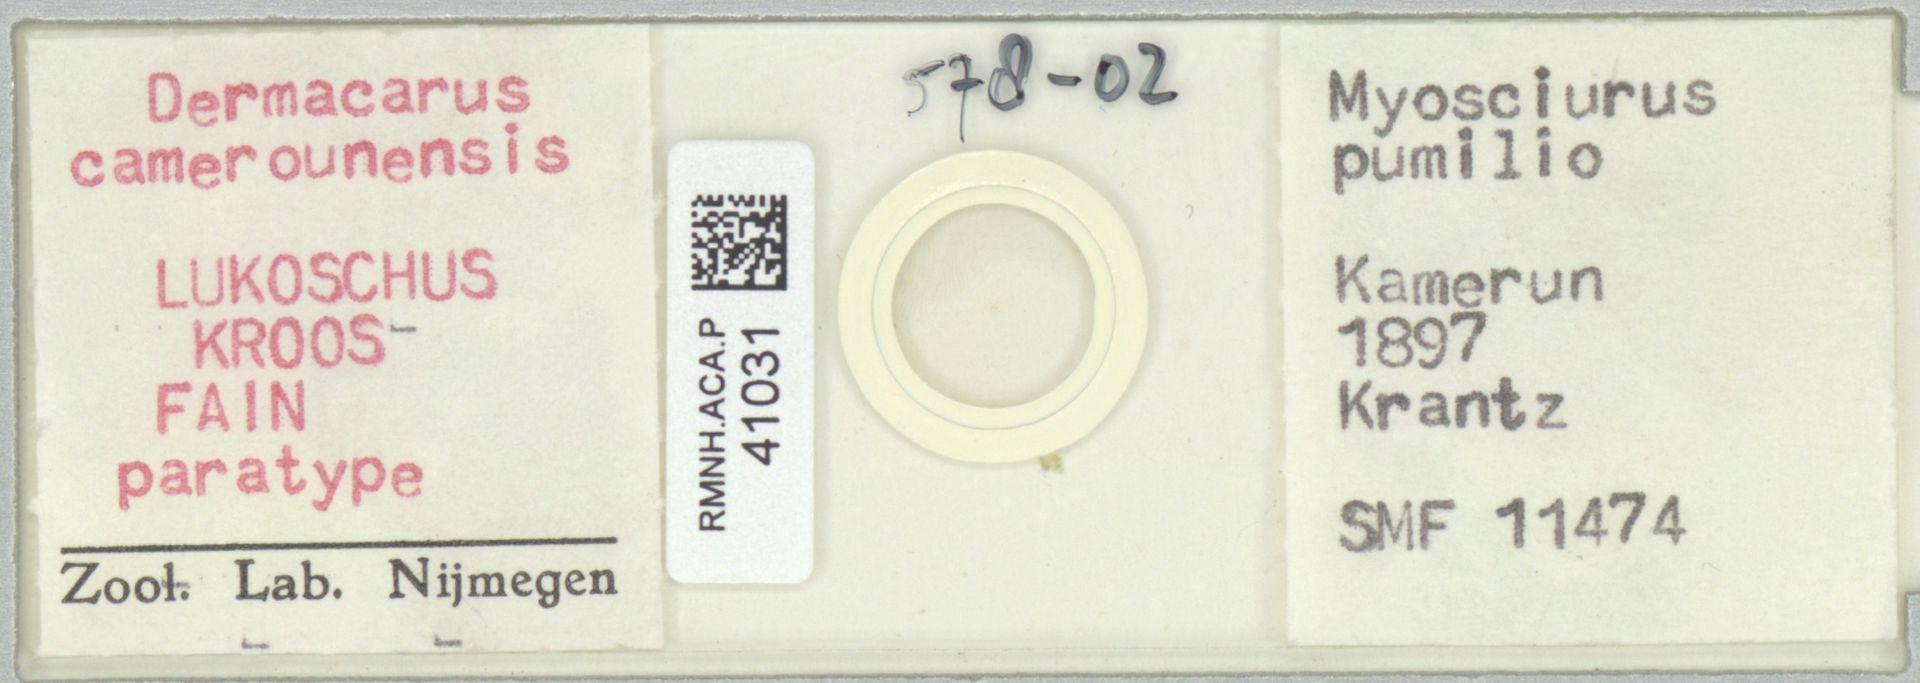 RMNH.ACA.P.41031 | Dermacarus camerounensis Lukoschus, Kroos & Fain